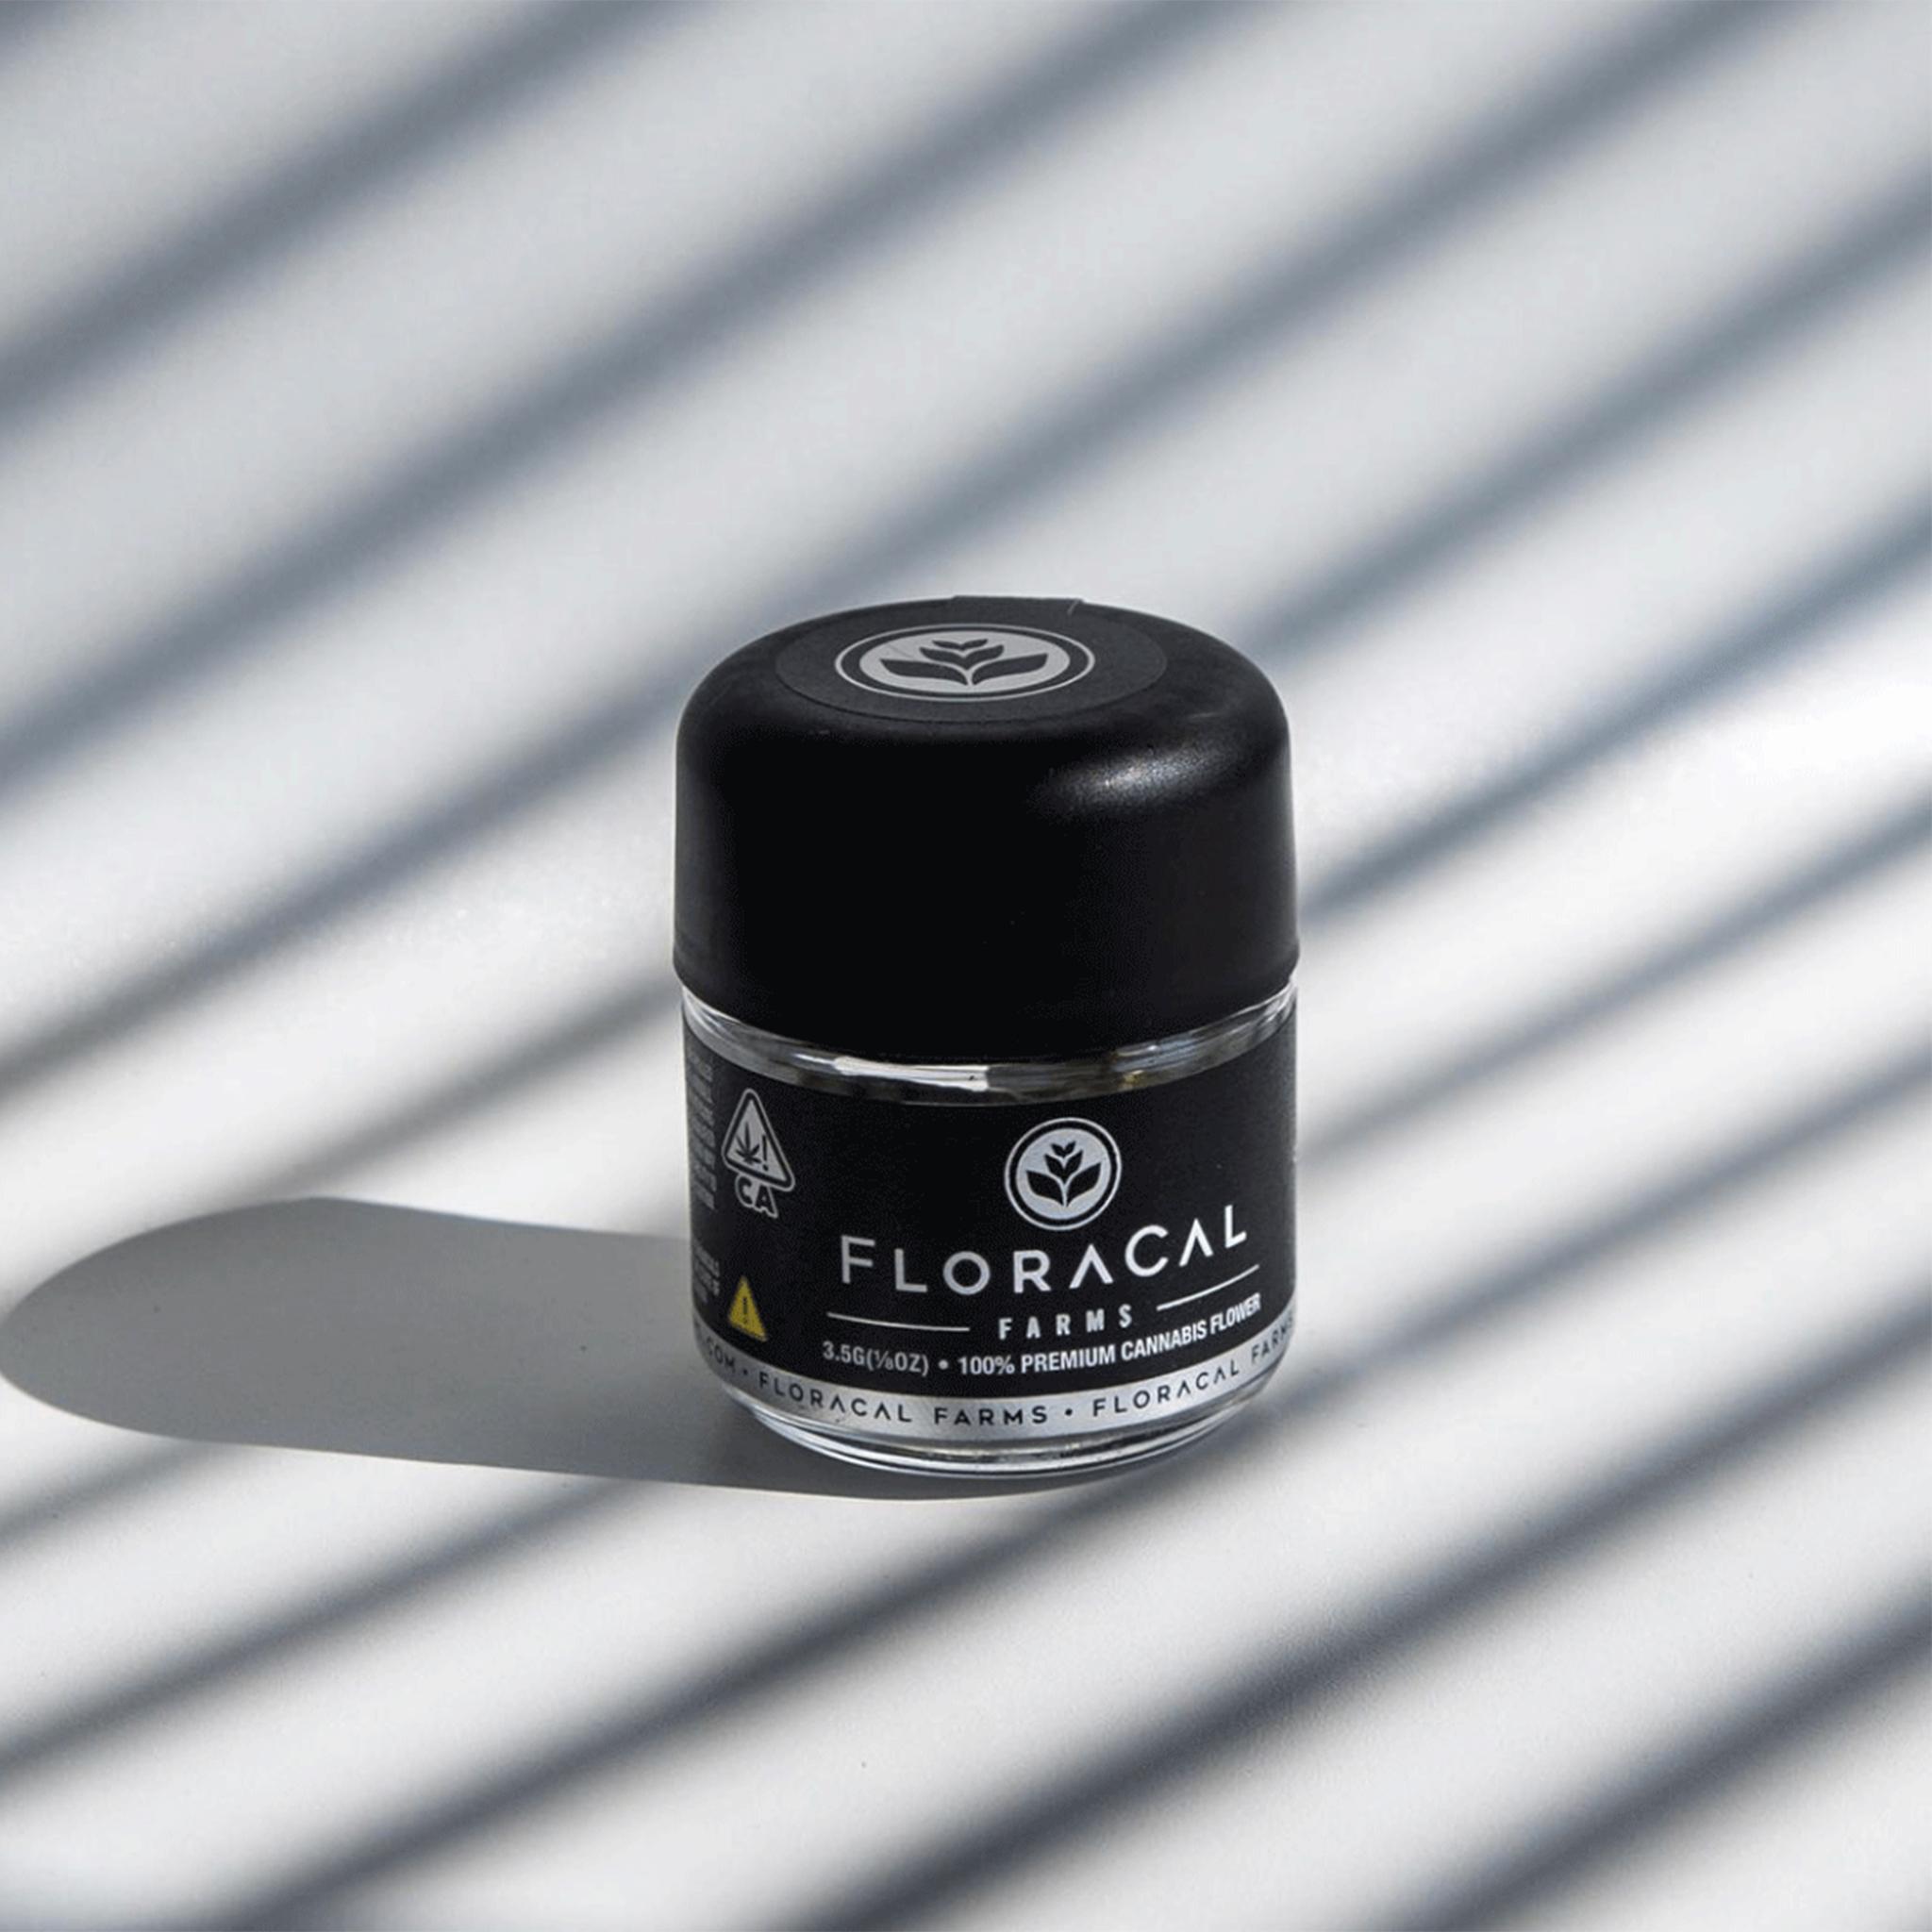 FloraCal Brand Hero